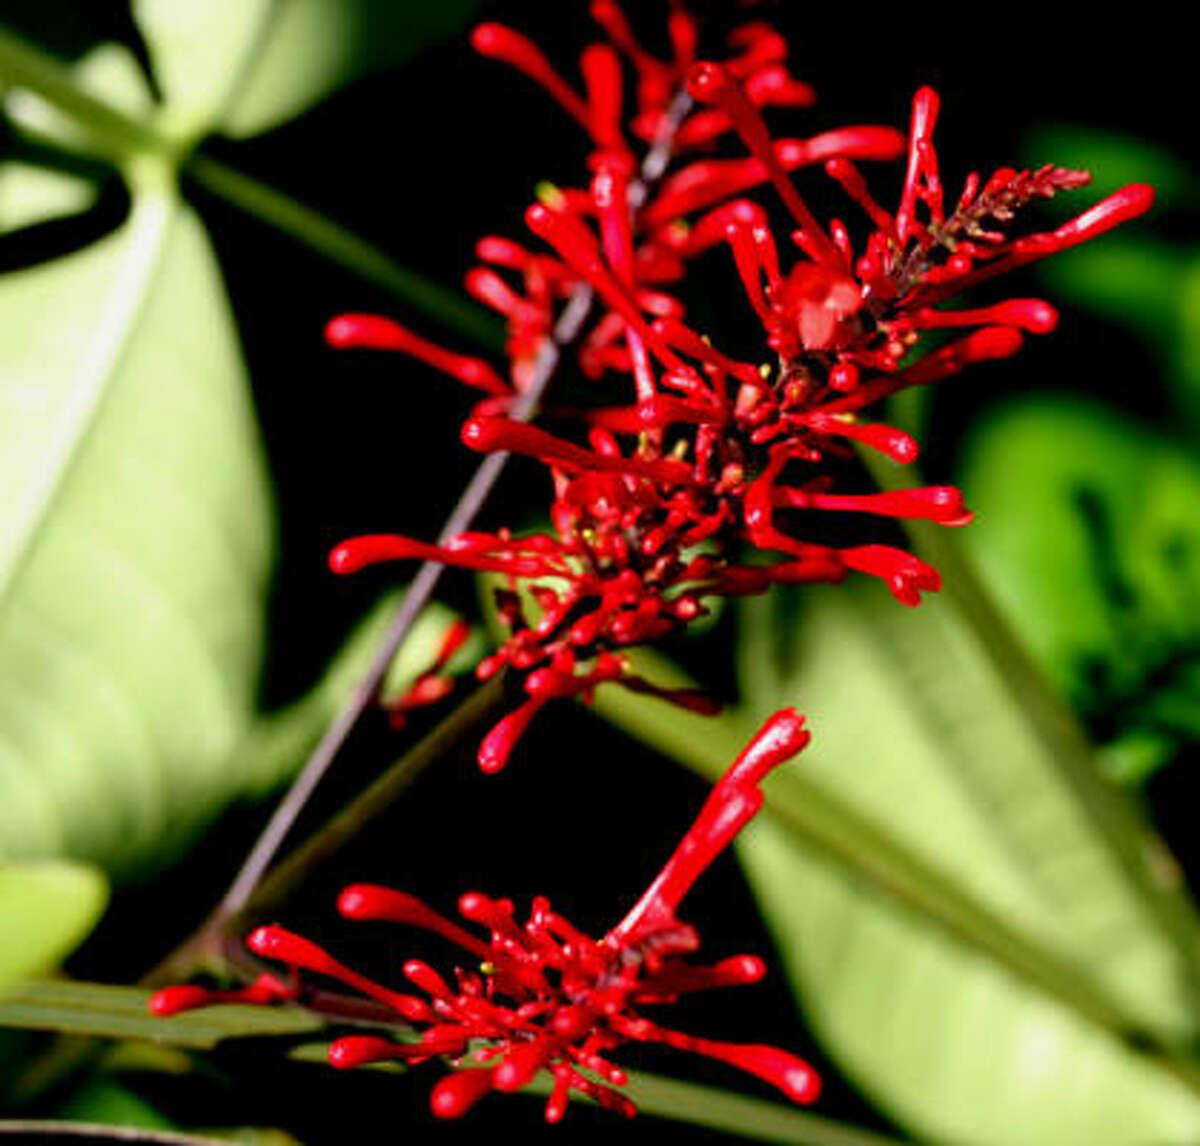 FirespikeButterhummer's patriotic garden | Submit your garden photos | Houston Plant Database | HoustonGrows.com